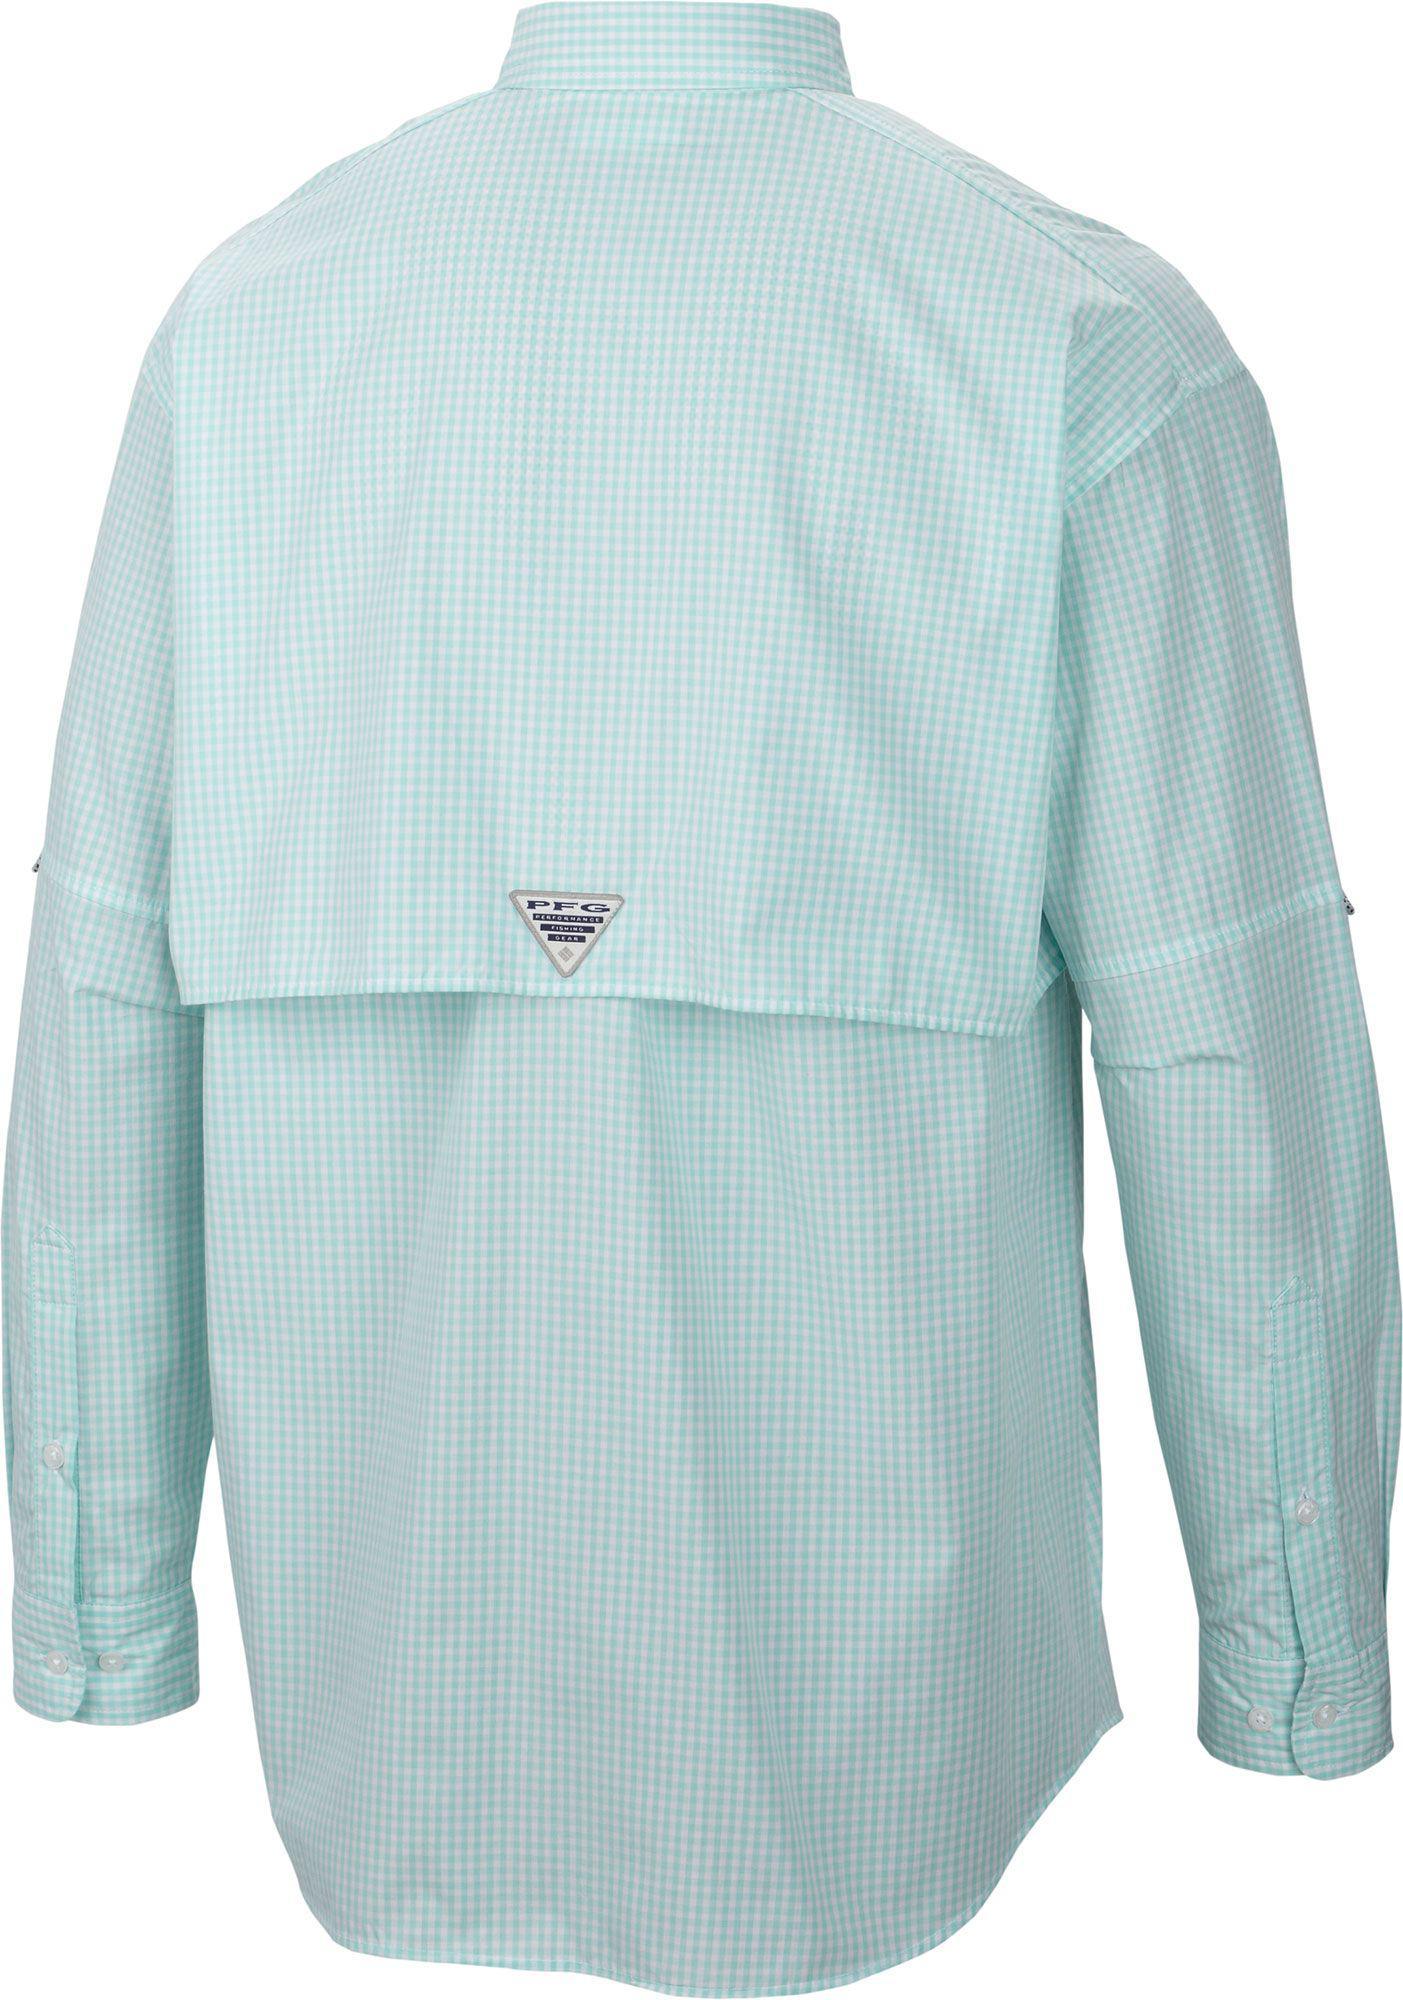 magellan angler fit fishing shirt - HD1403×2000